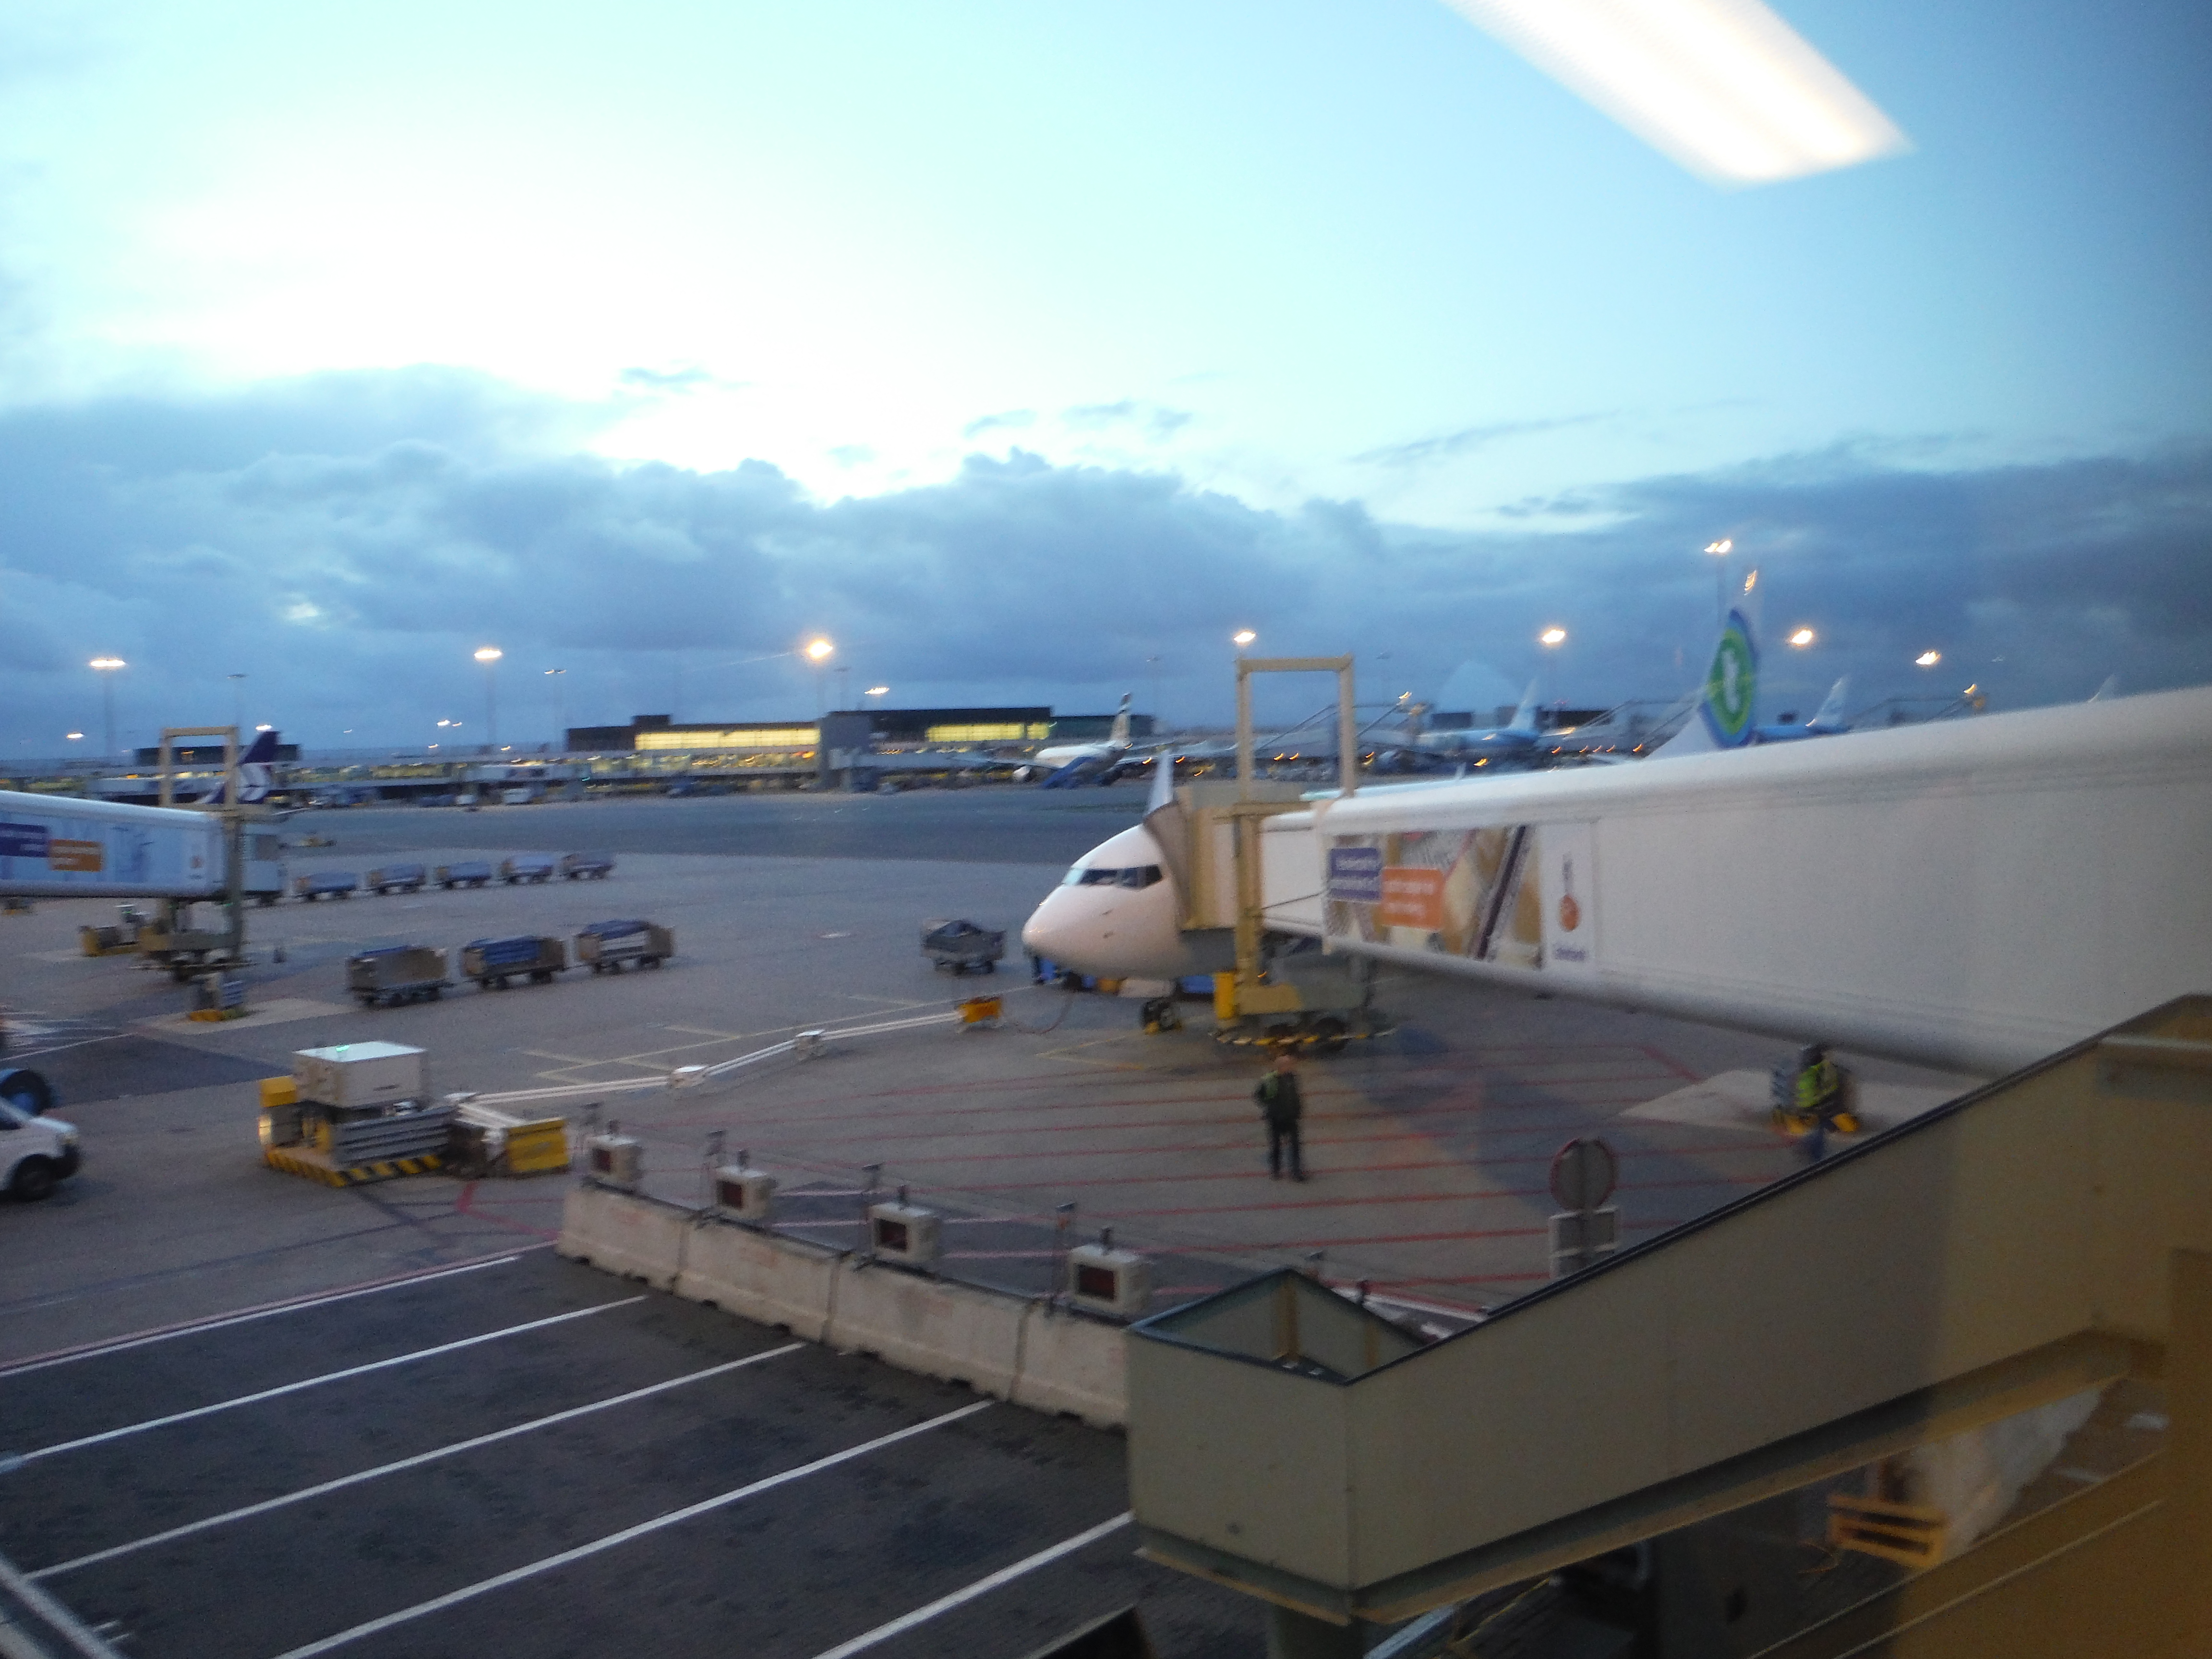 Trasavia plane at jetway